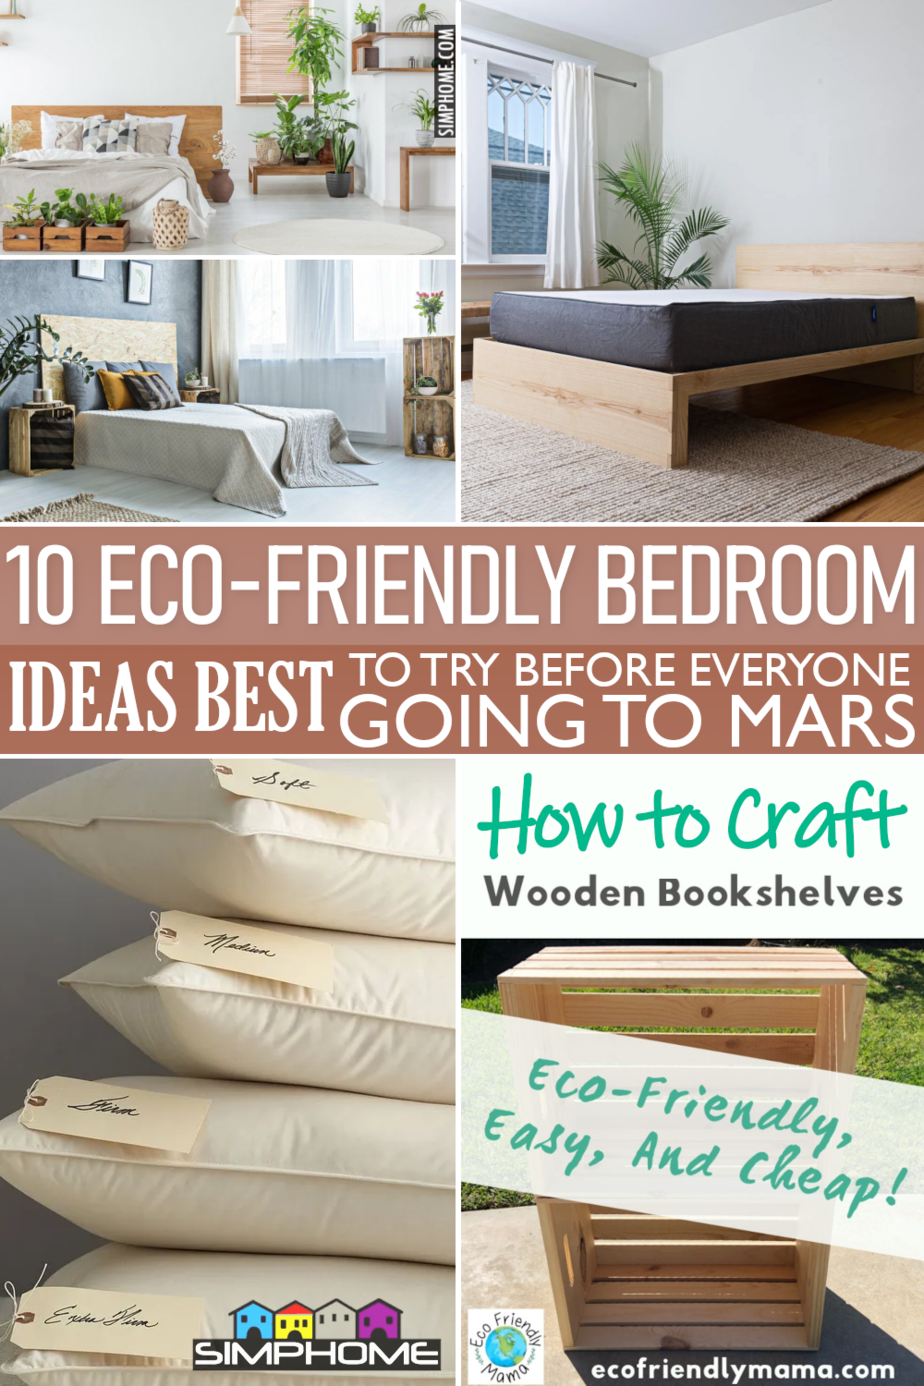 10 Ideas to Design Eco Friendly Bedroom VIA Simphome.comFeatured 1